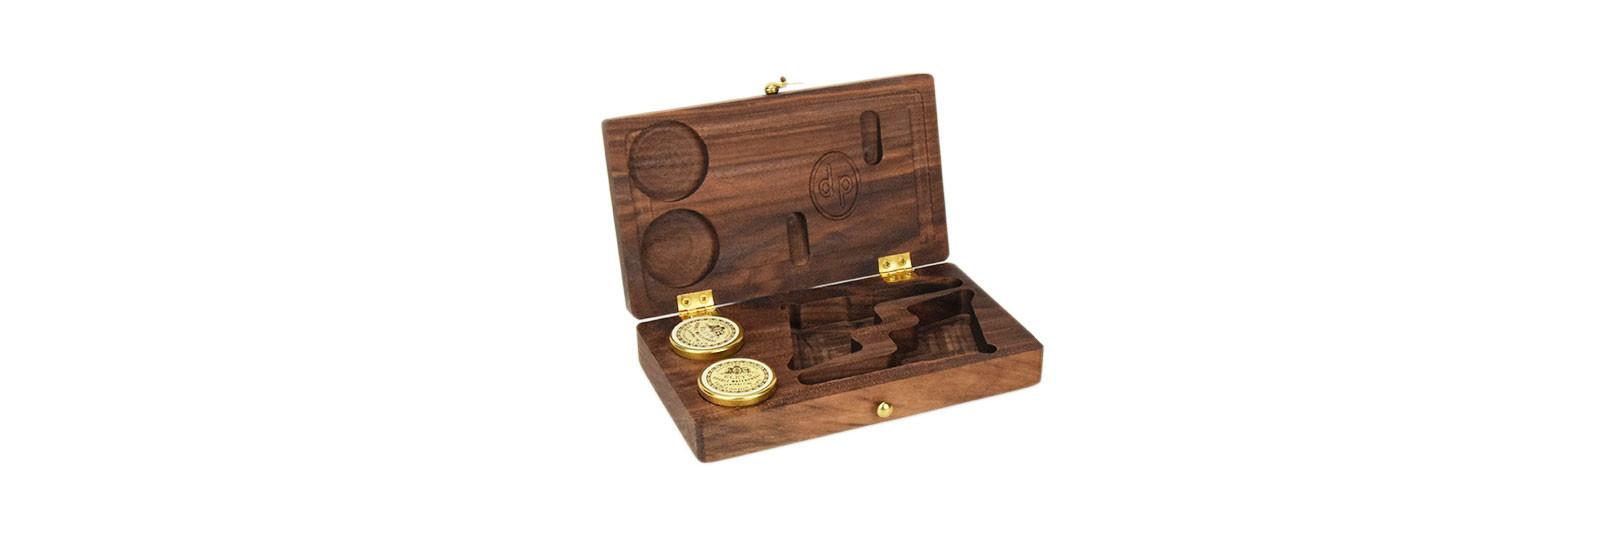 Wood case for 2 Derringer Rider pistols